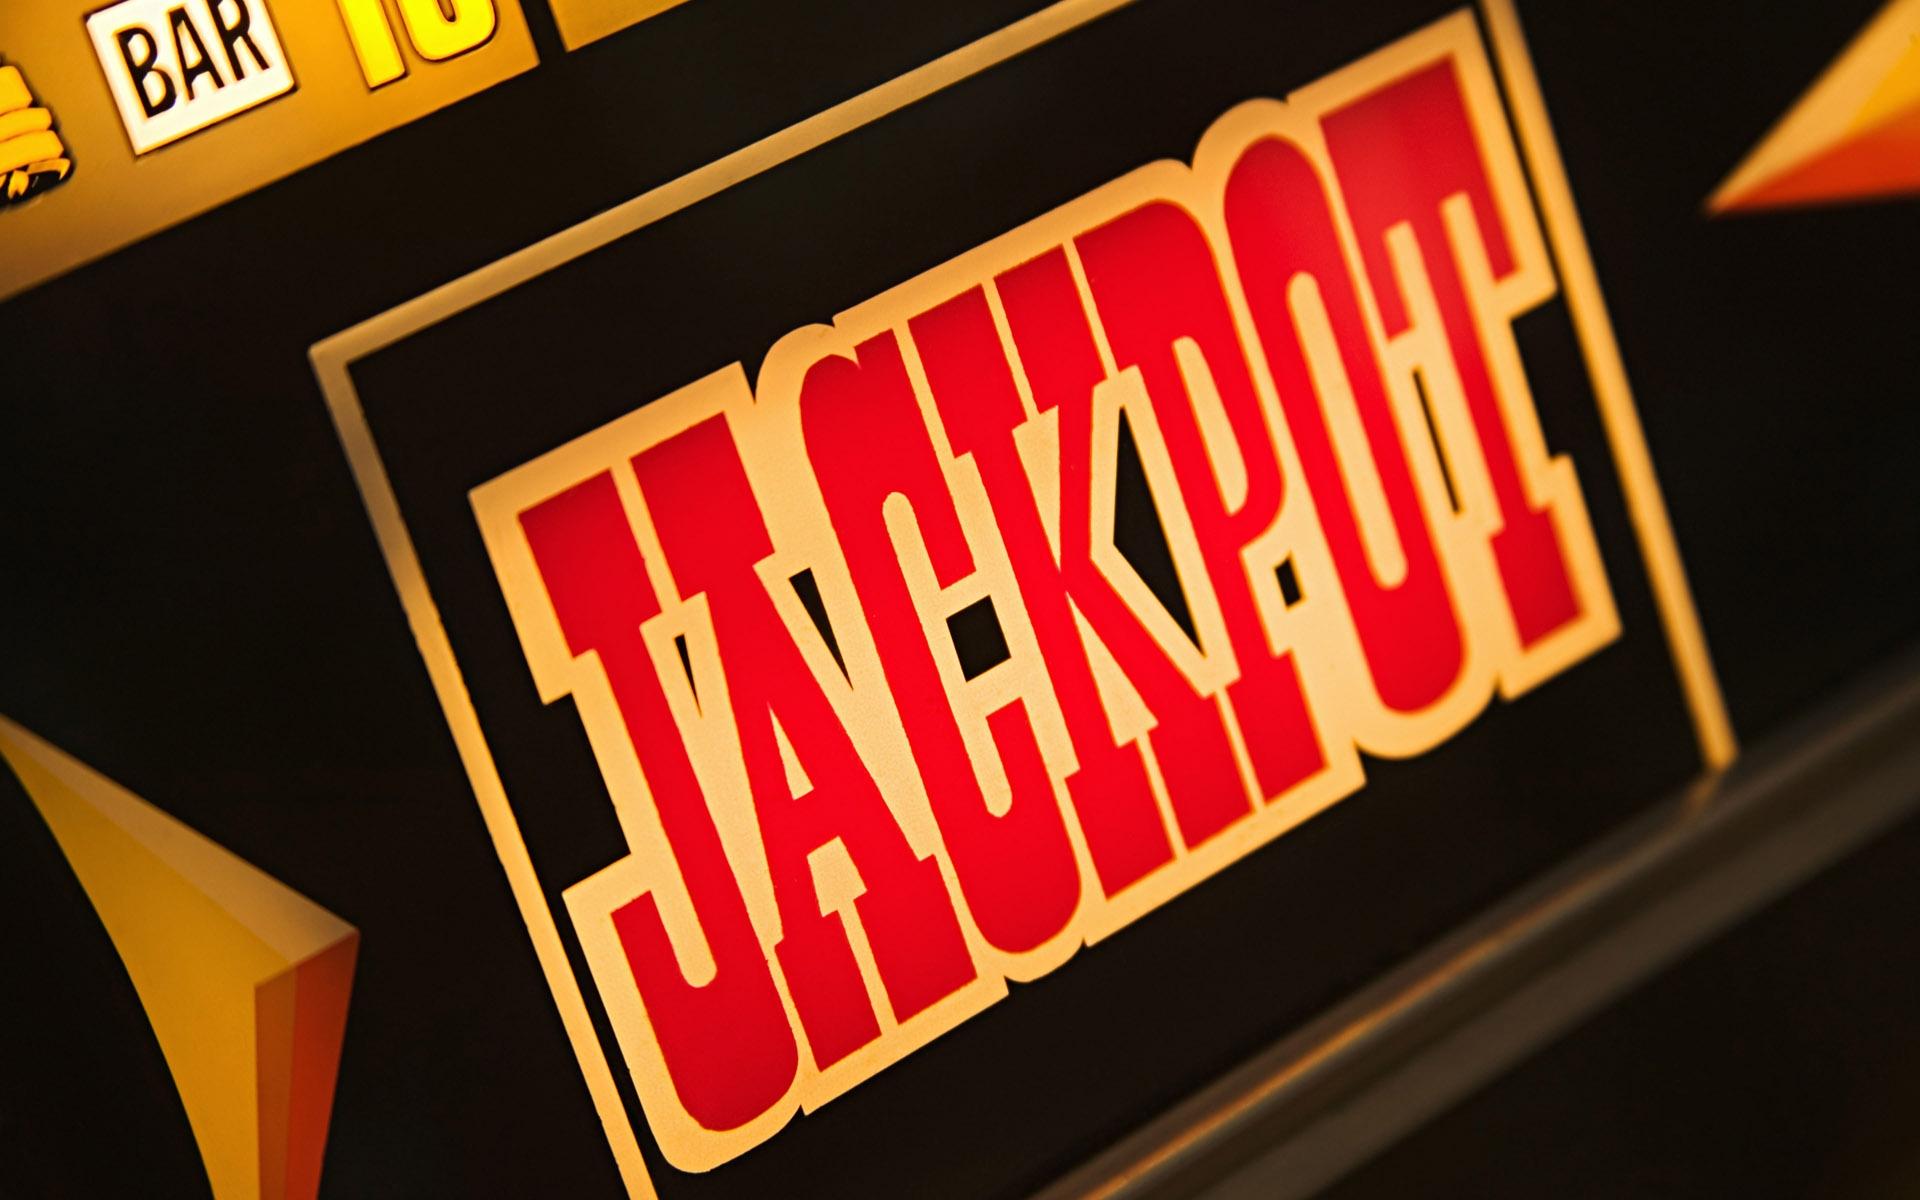 Casino HD Wallpaper Background Image 1920x1200 ID280549 1920x1200